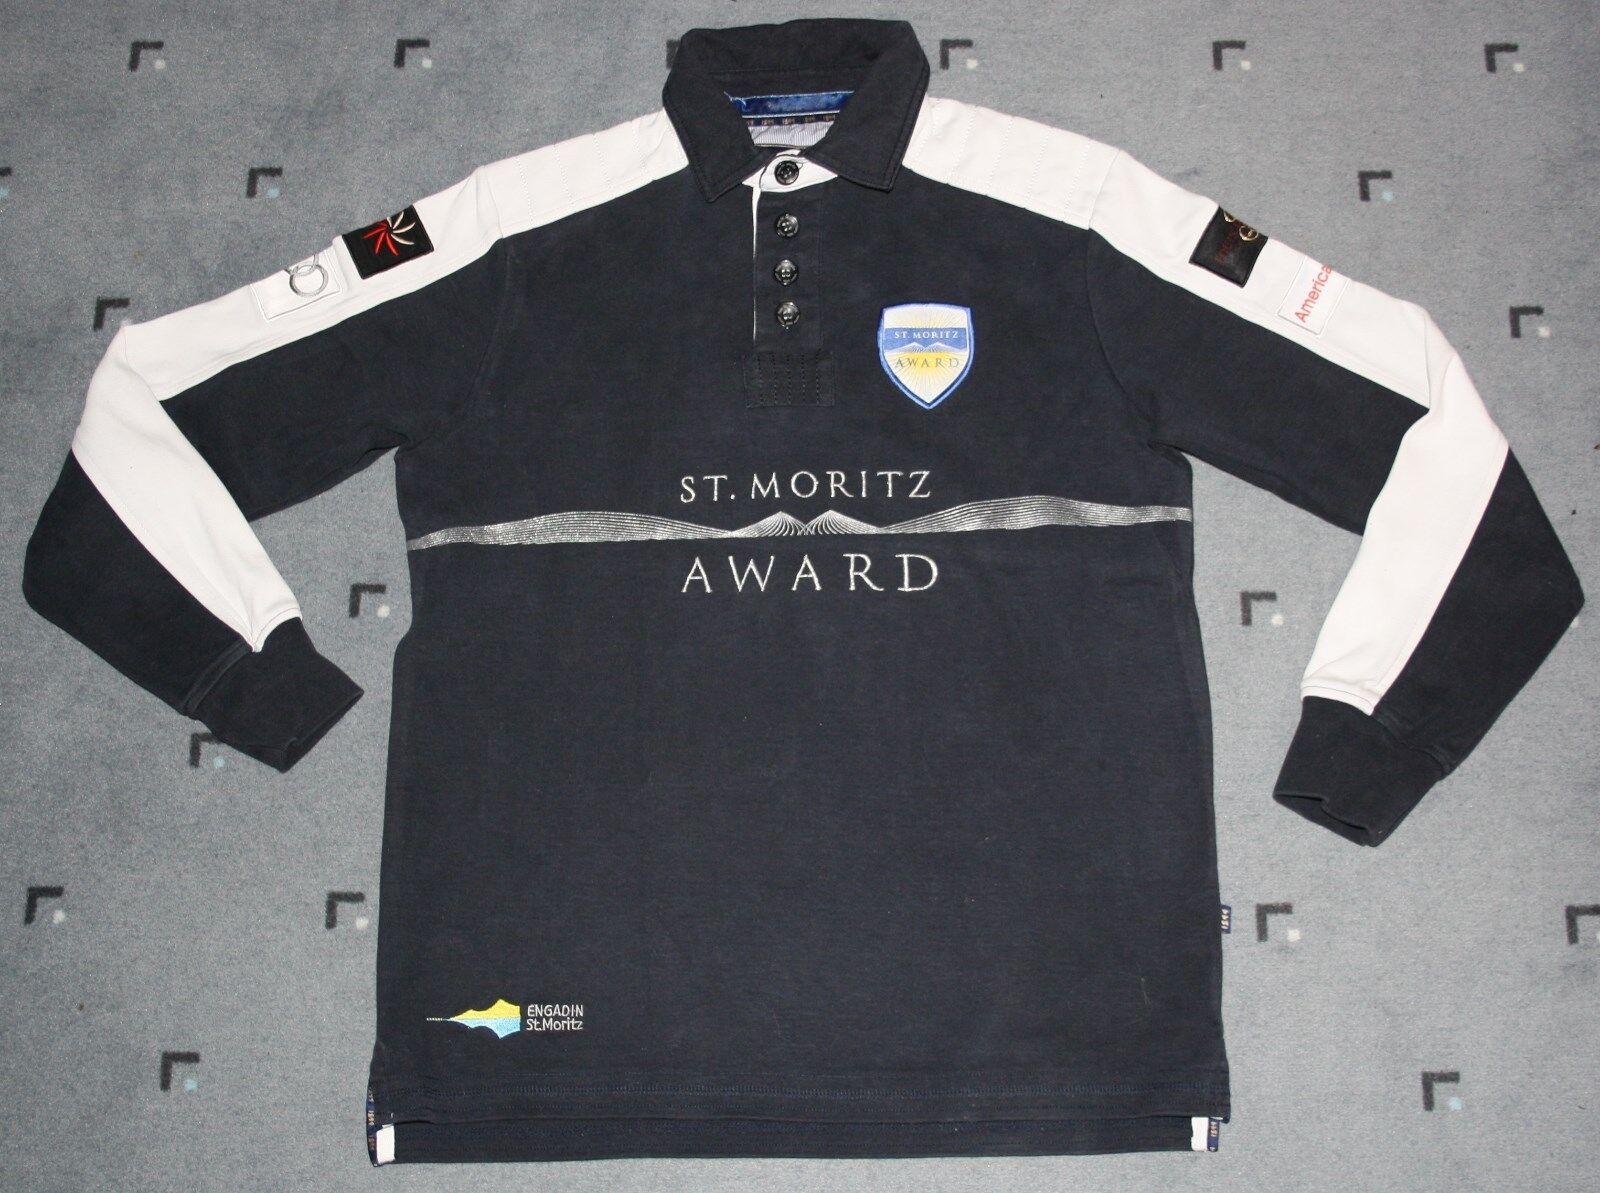 Polo St. Moritz 1899 1899 1899  St. Moritz Award  Herren Polohemd langarm blau Gr. XS   S  | Düsseldorf Online Shop  1d4356